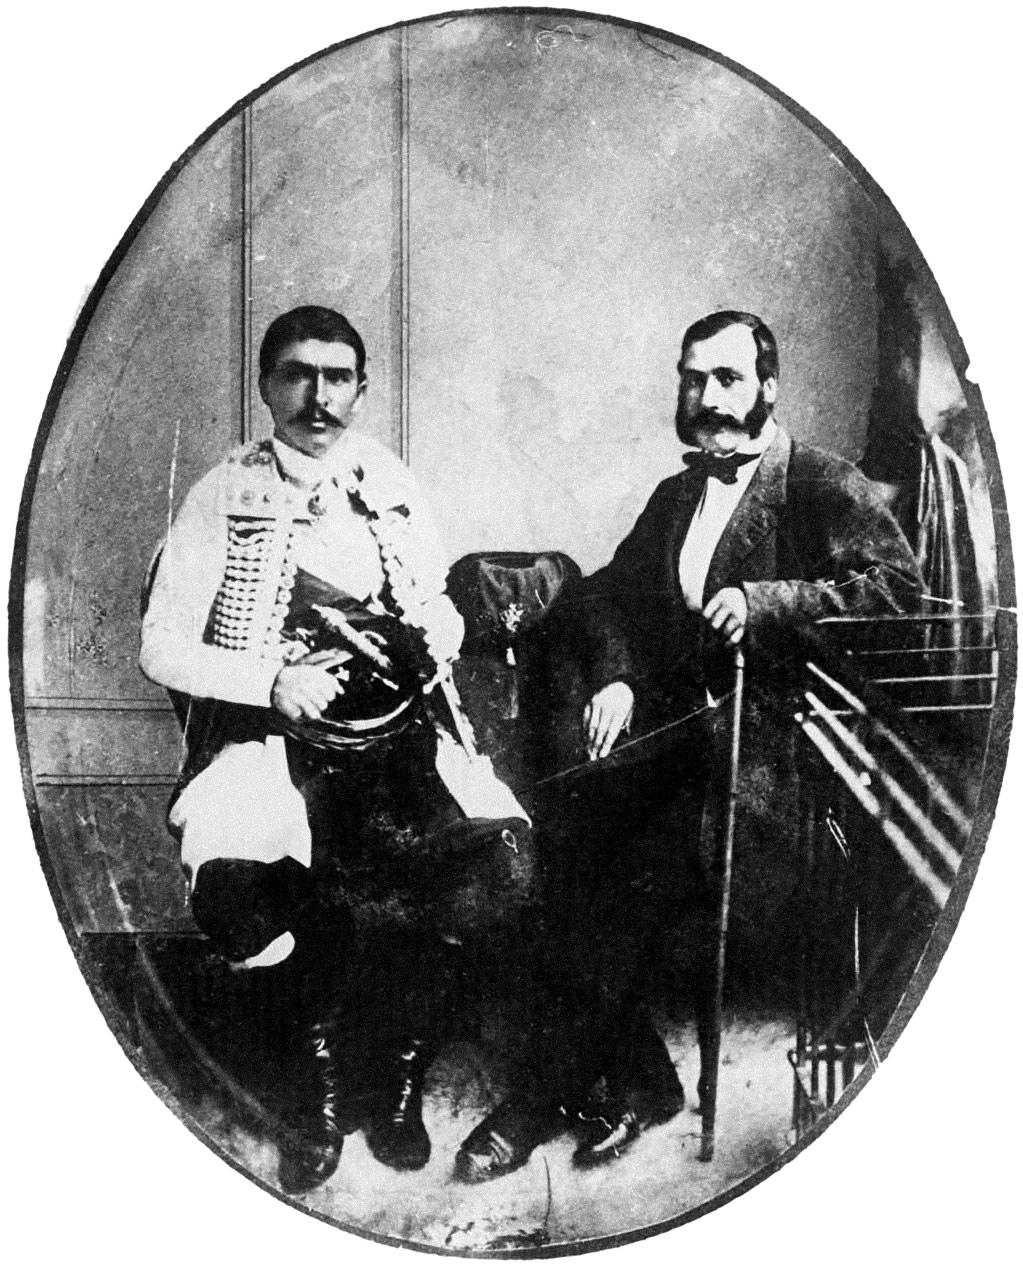 https://upload.wikimedia.org/wikipedia/commons/5/5f/%C4%90uro_Matanovi%C4%87_Georgi_Rakovski_1861.jpg